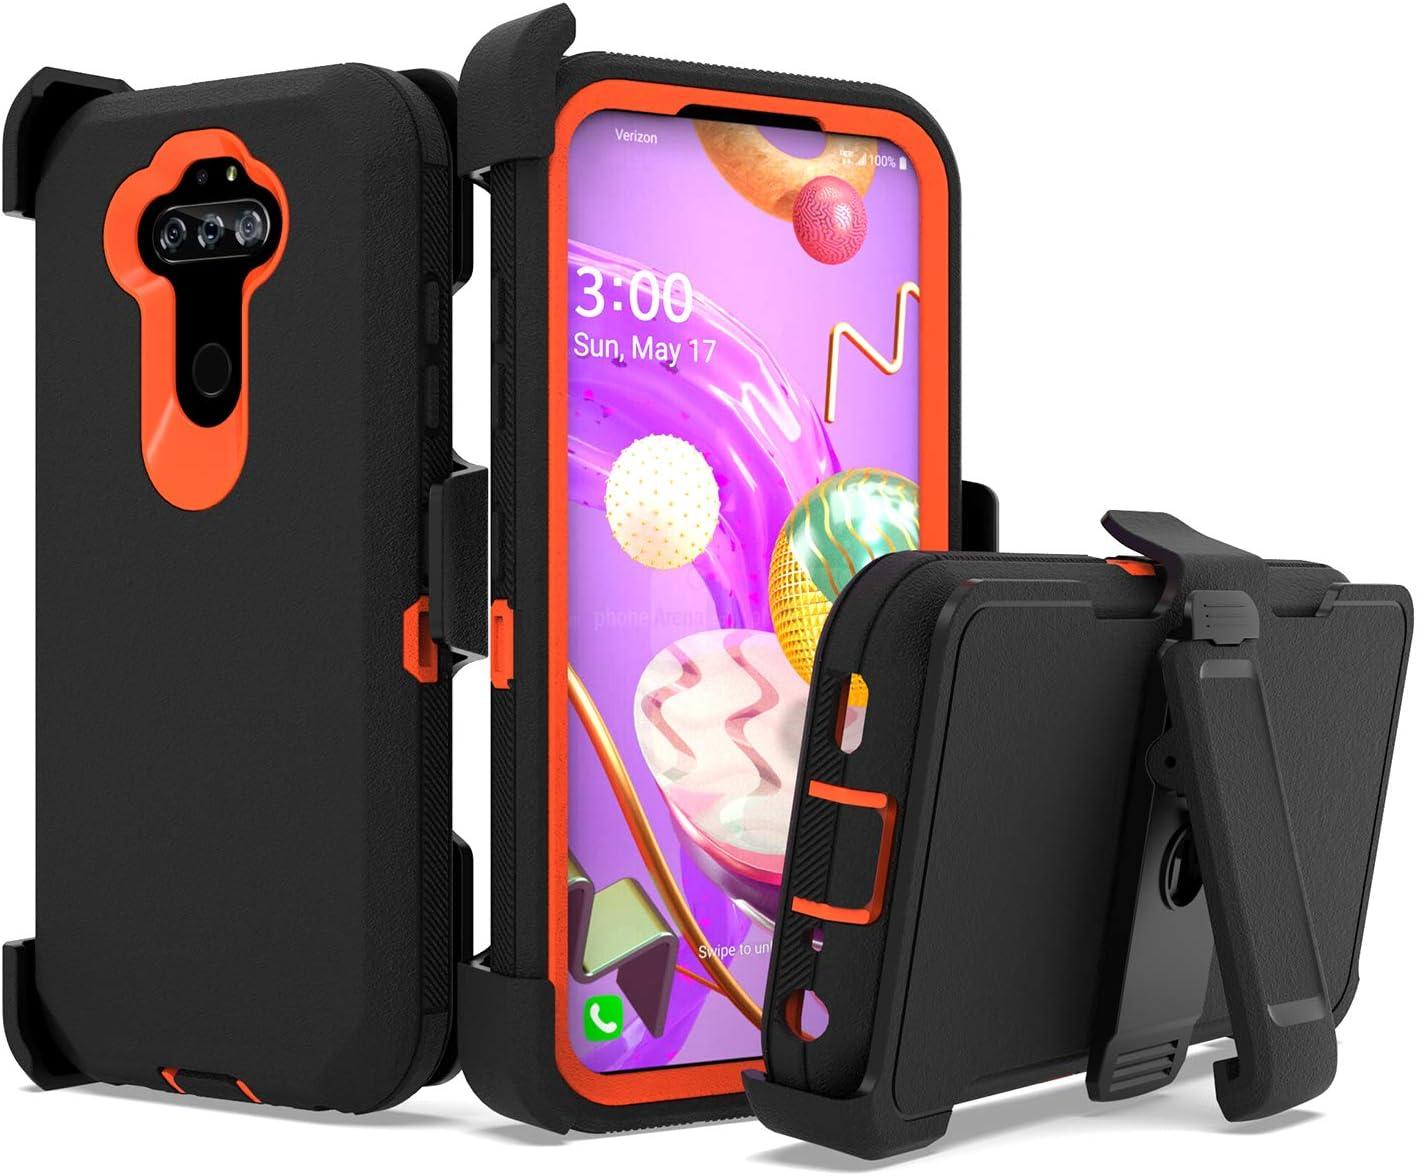 UNC Pro Belt Clip Holster Cell Phone Case for LG Aristo 5/Aristo 5 Plus +/K31/Phoenix 5/Fortune 3/Tribute Monarch/K8x/Risio 4, Heavy Duty Hybrid Shockproof Bumper Case w/Kickstand, Black/Orange